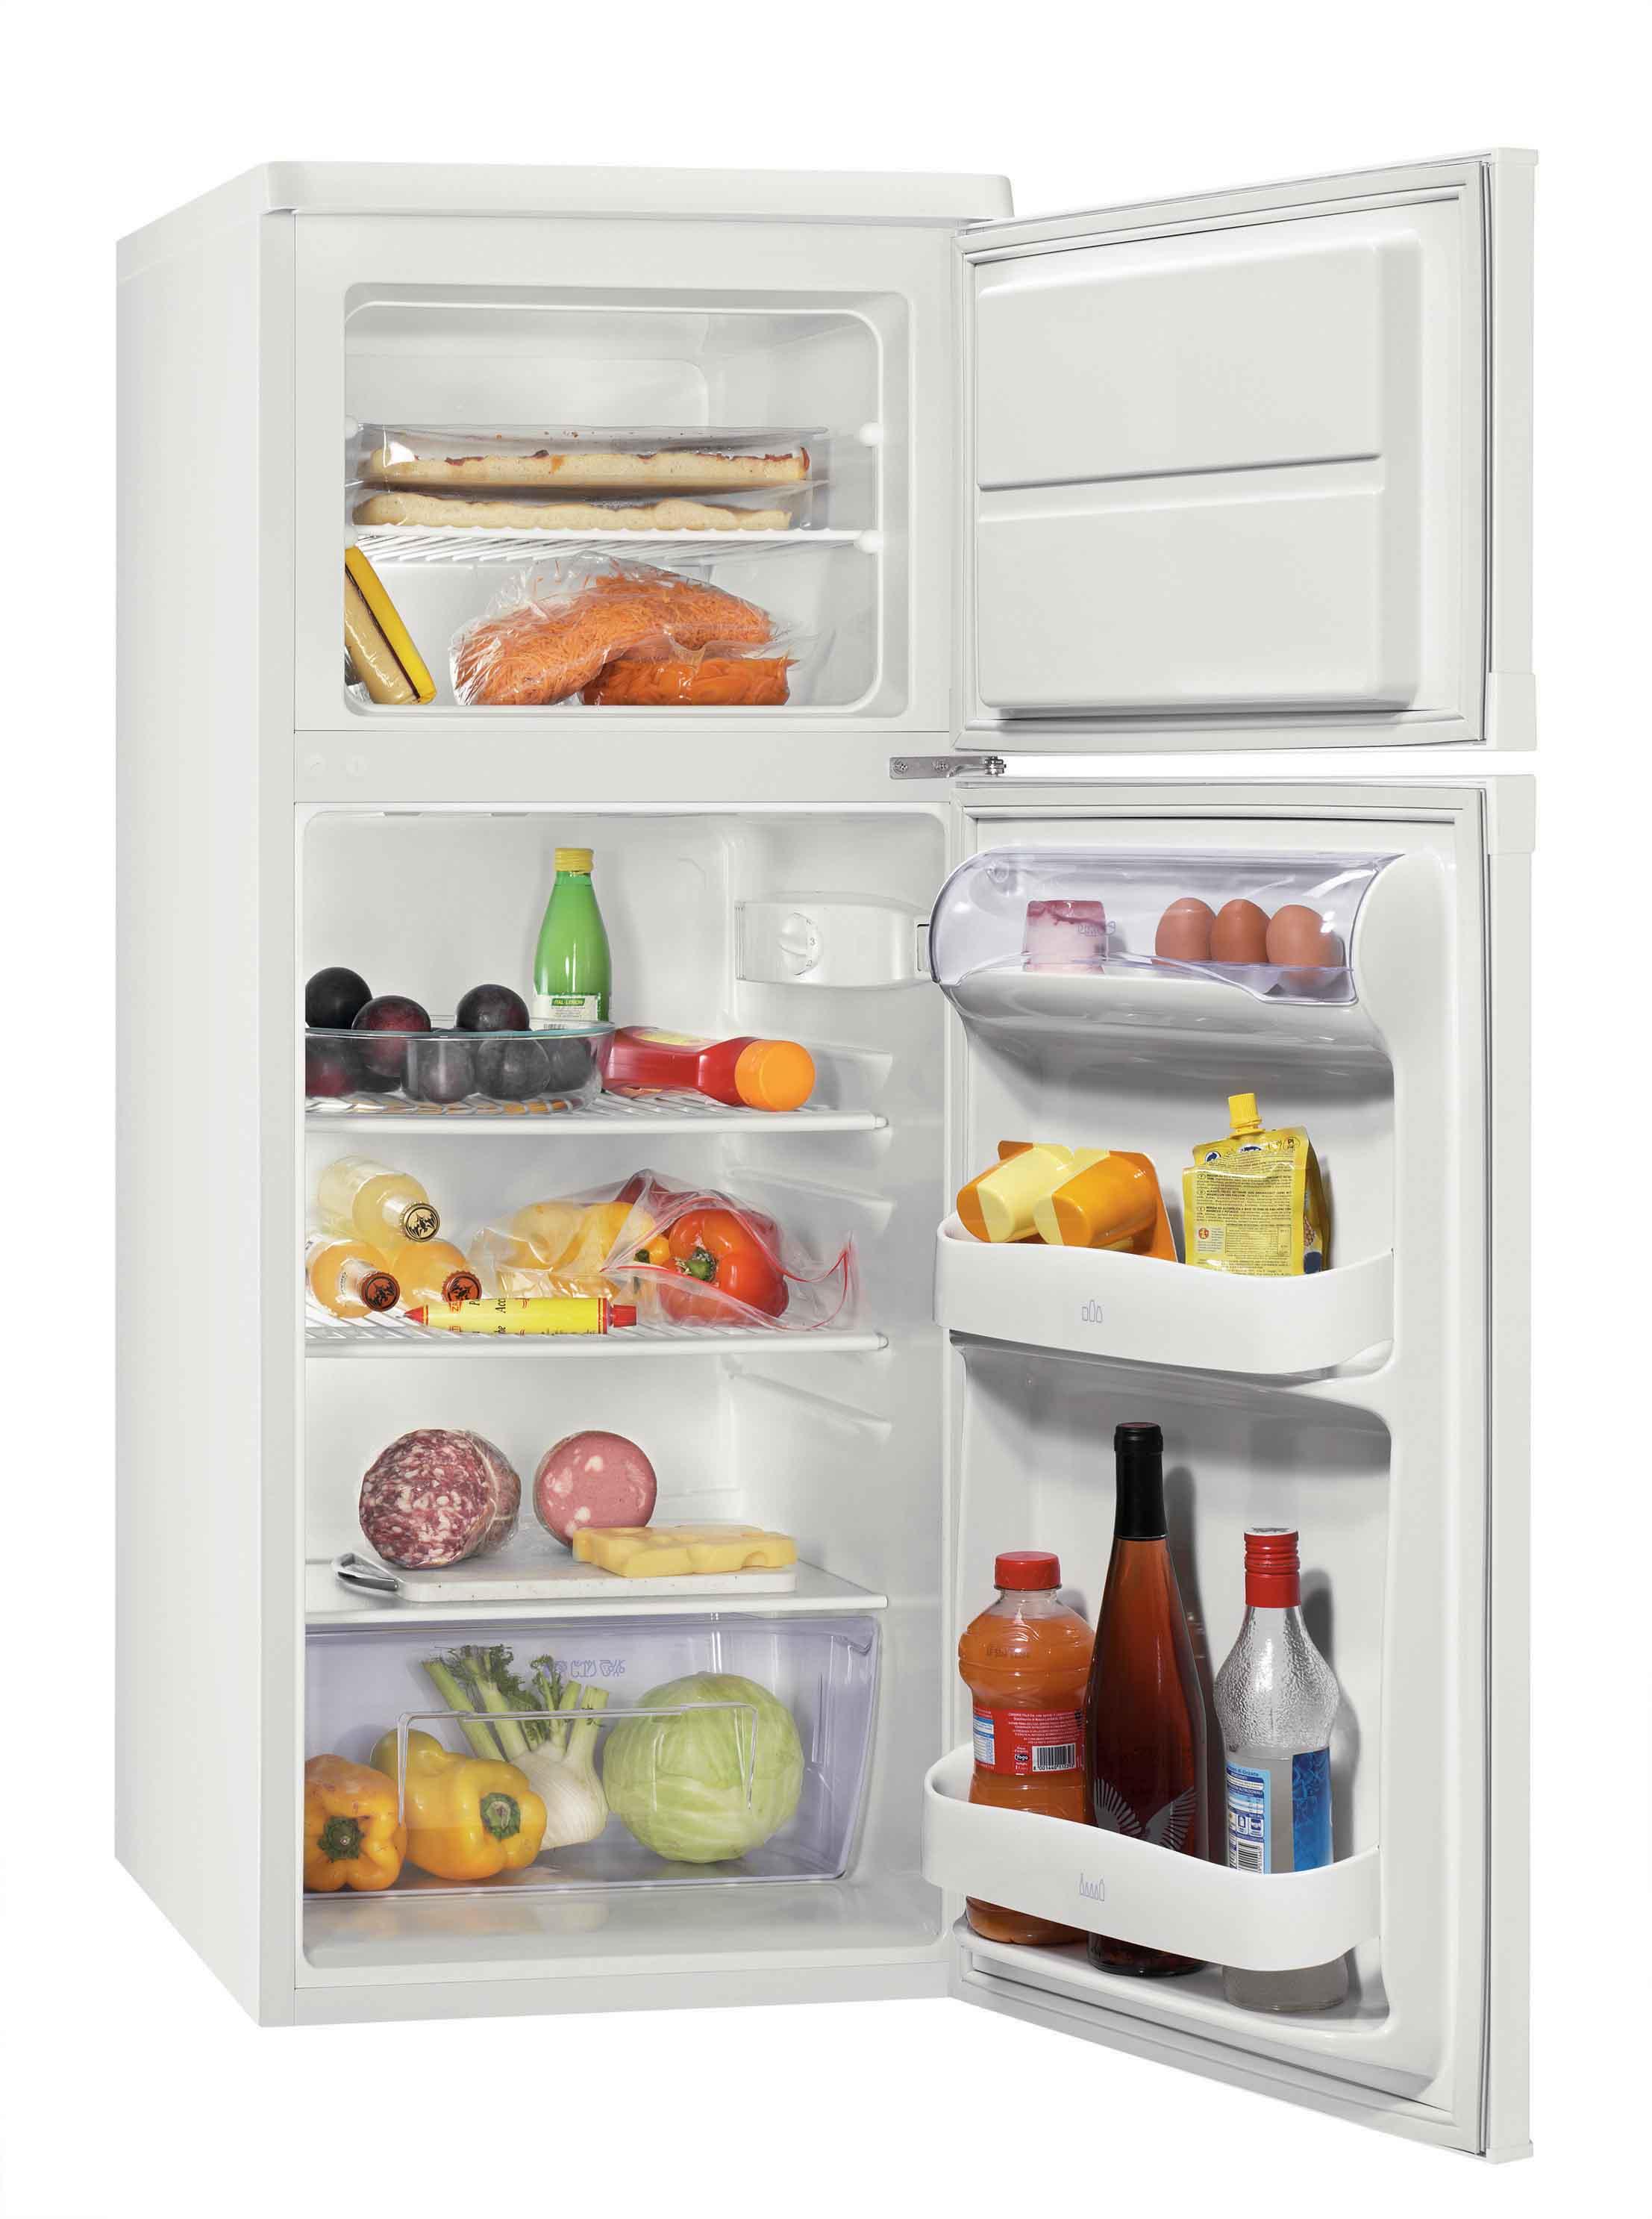 Clean Green Bristol clean fridge